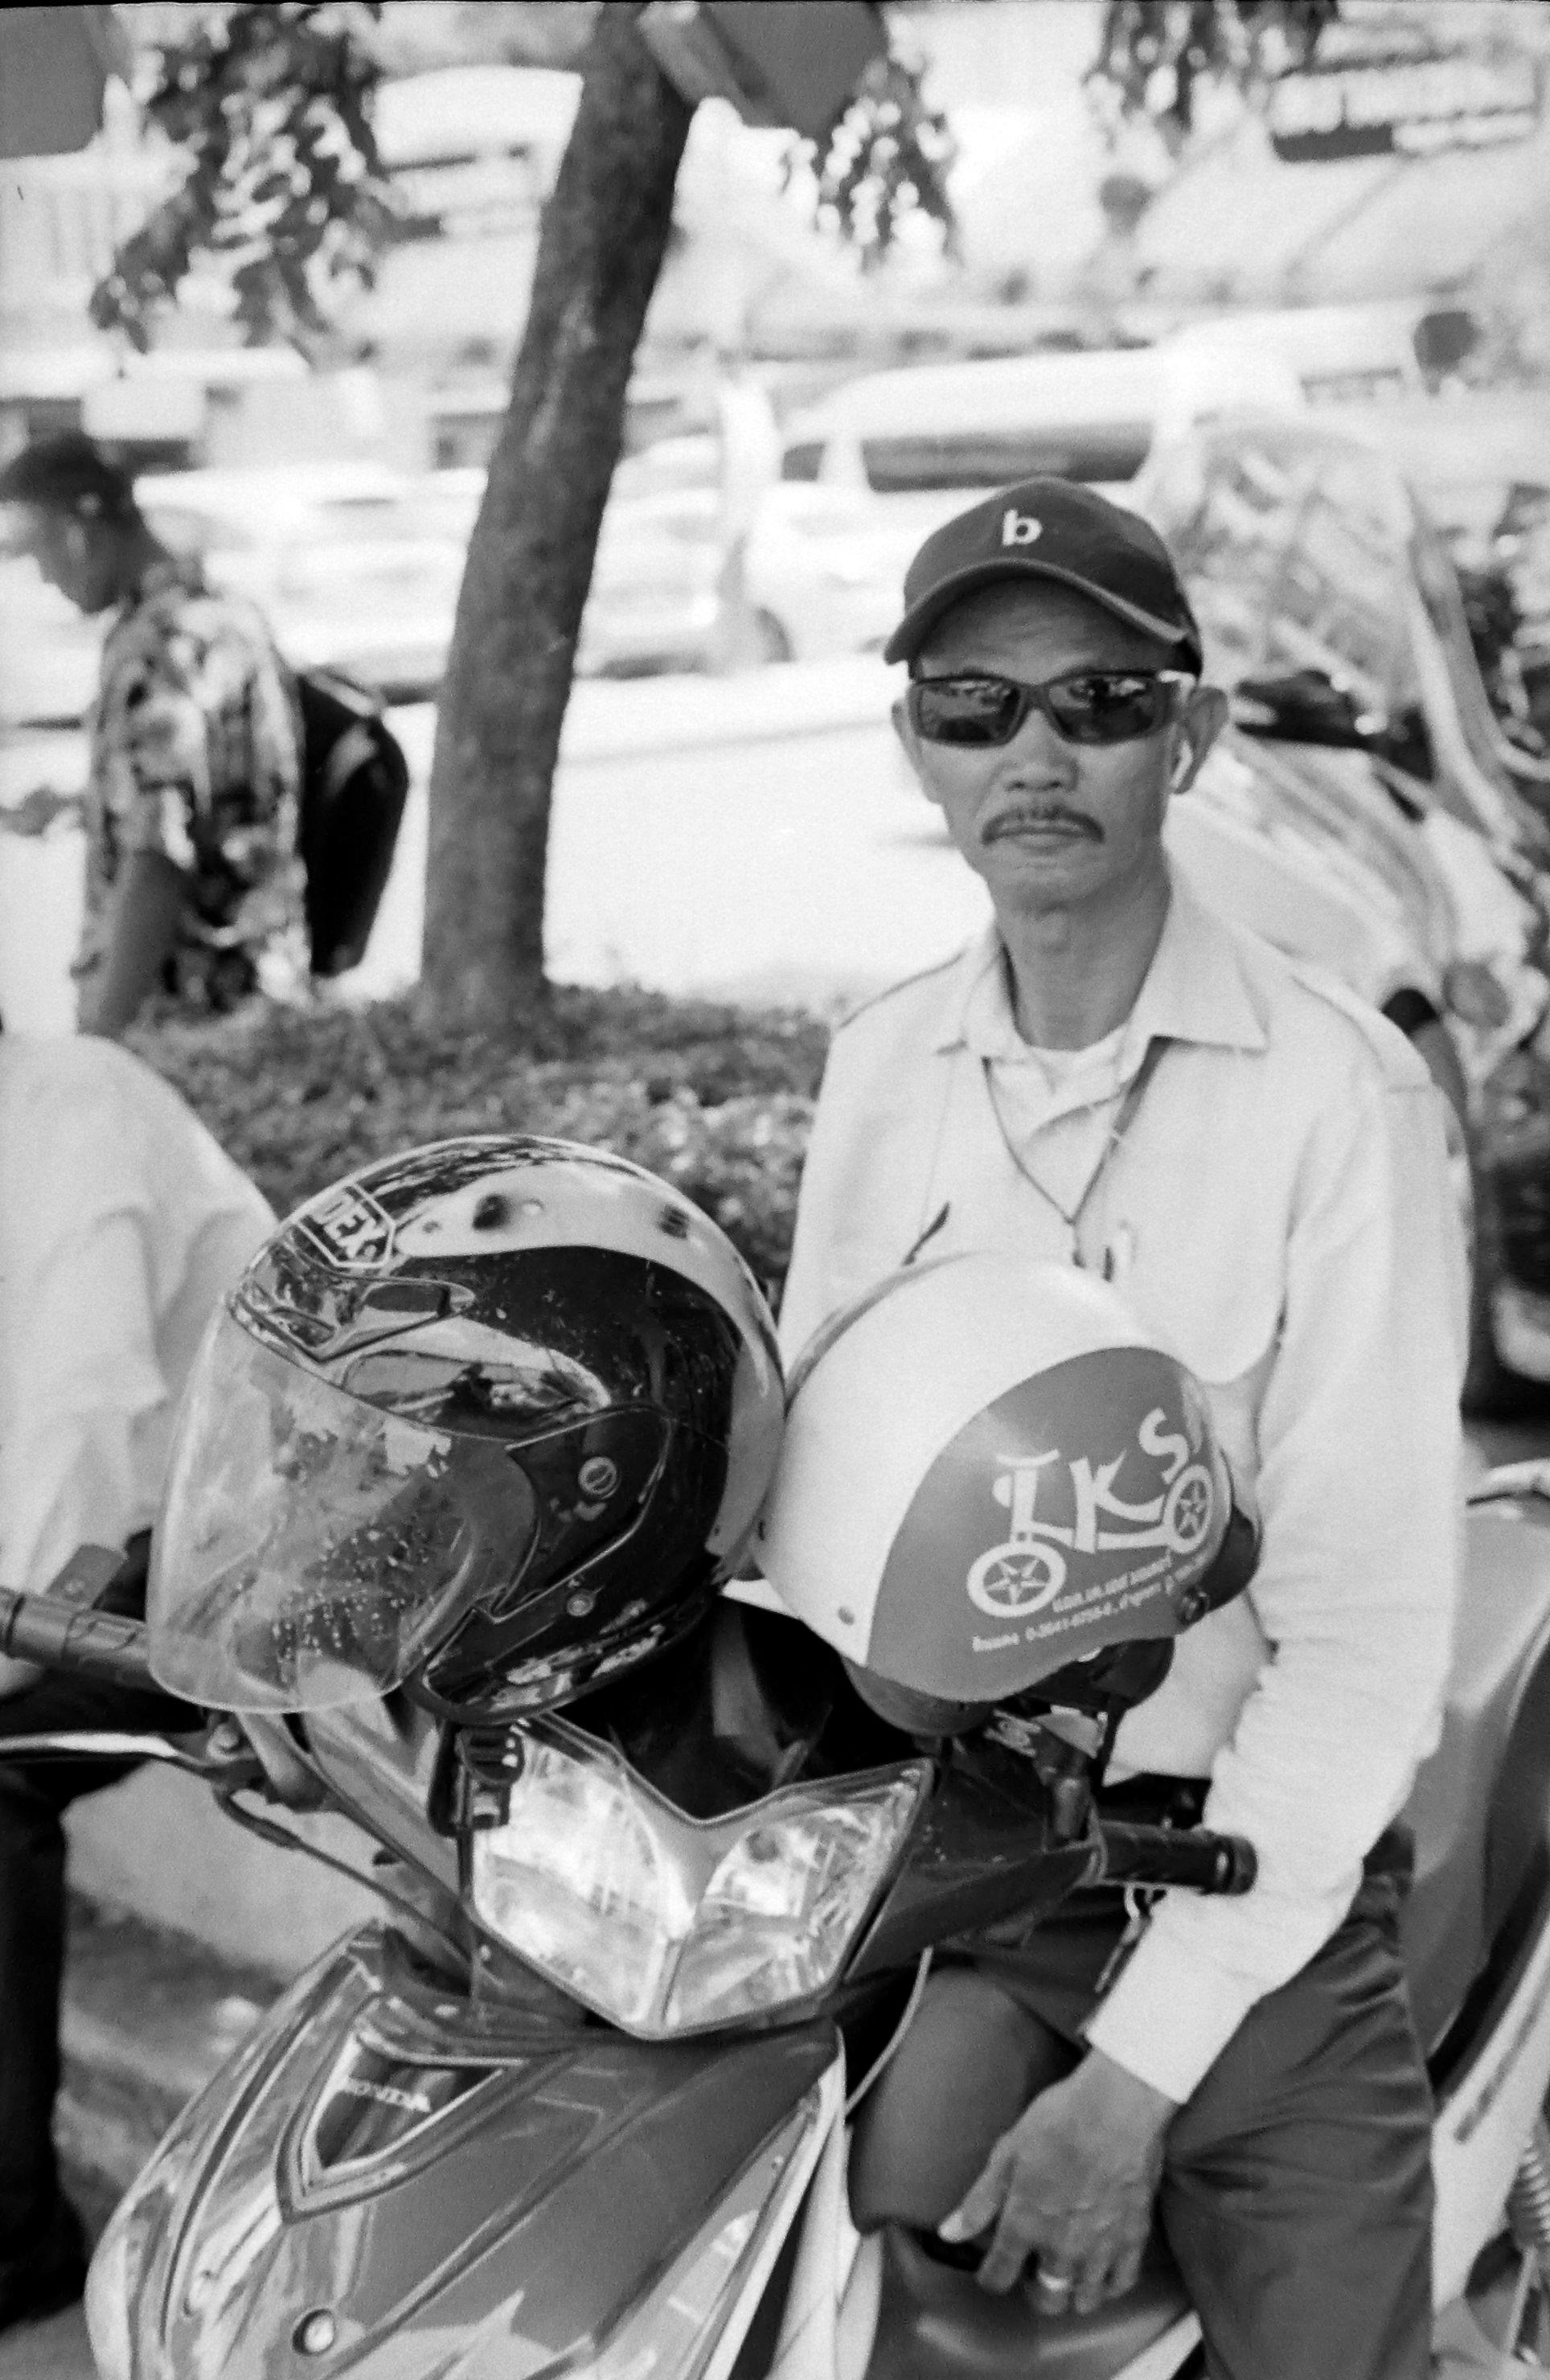 chromacomaphoto street photography bangkok thailand film tri x summicron rigid 50 leica m4 black and white (8).JPG